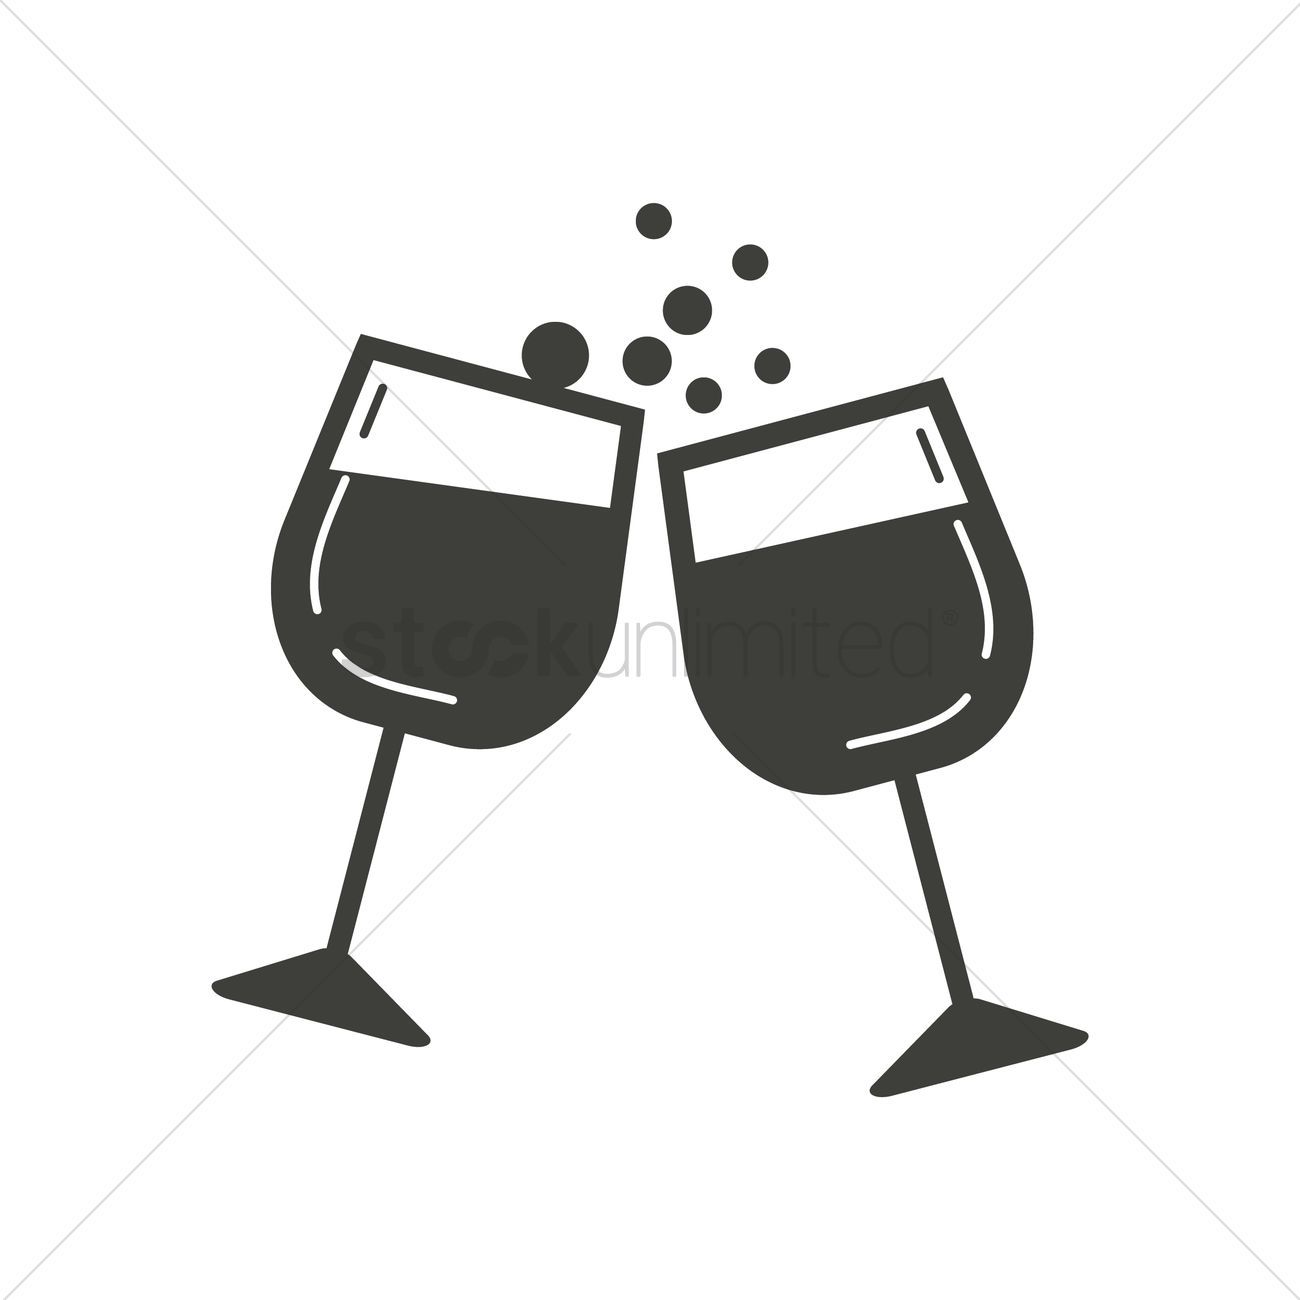 508 Wine Glasses free clipart.